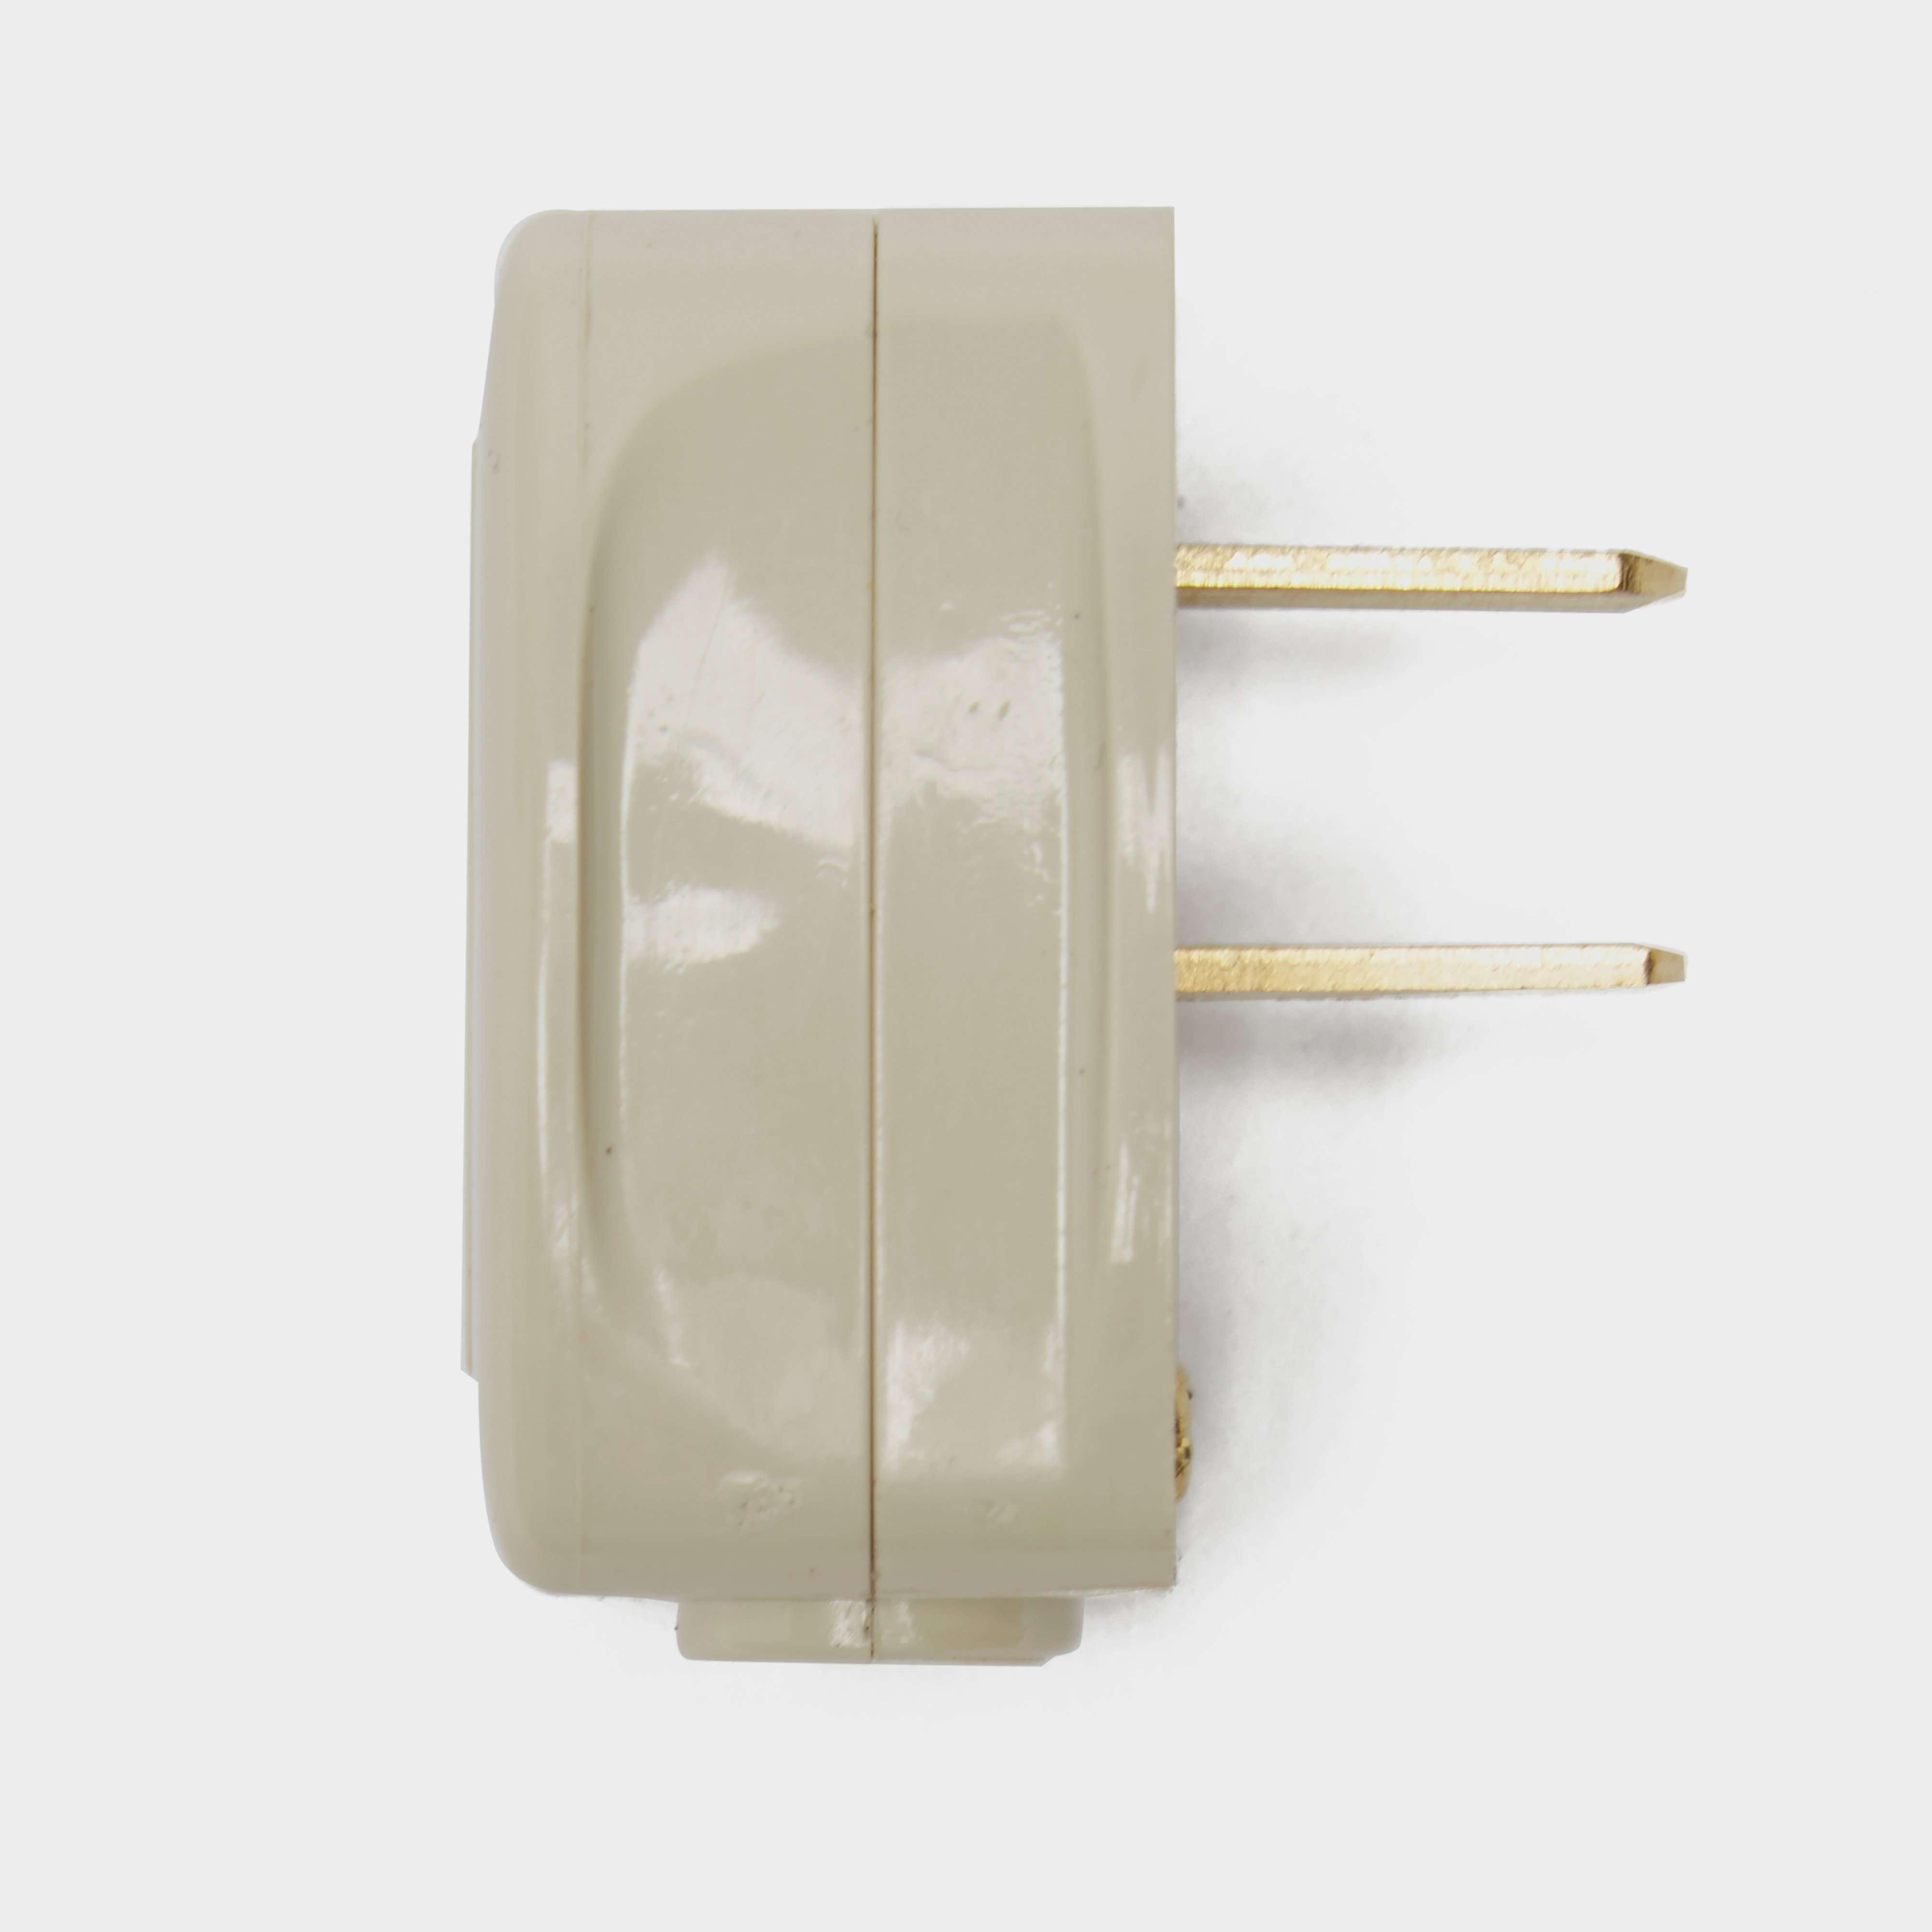 W4 Clipsal 2-pin 12V Plug